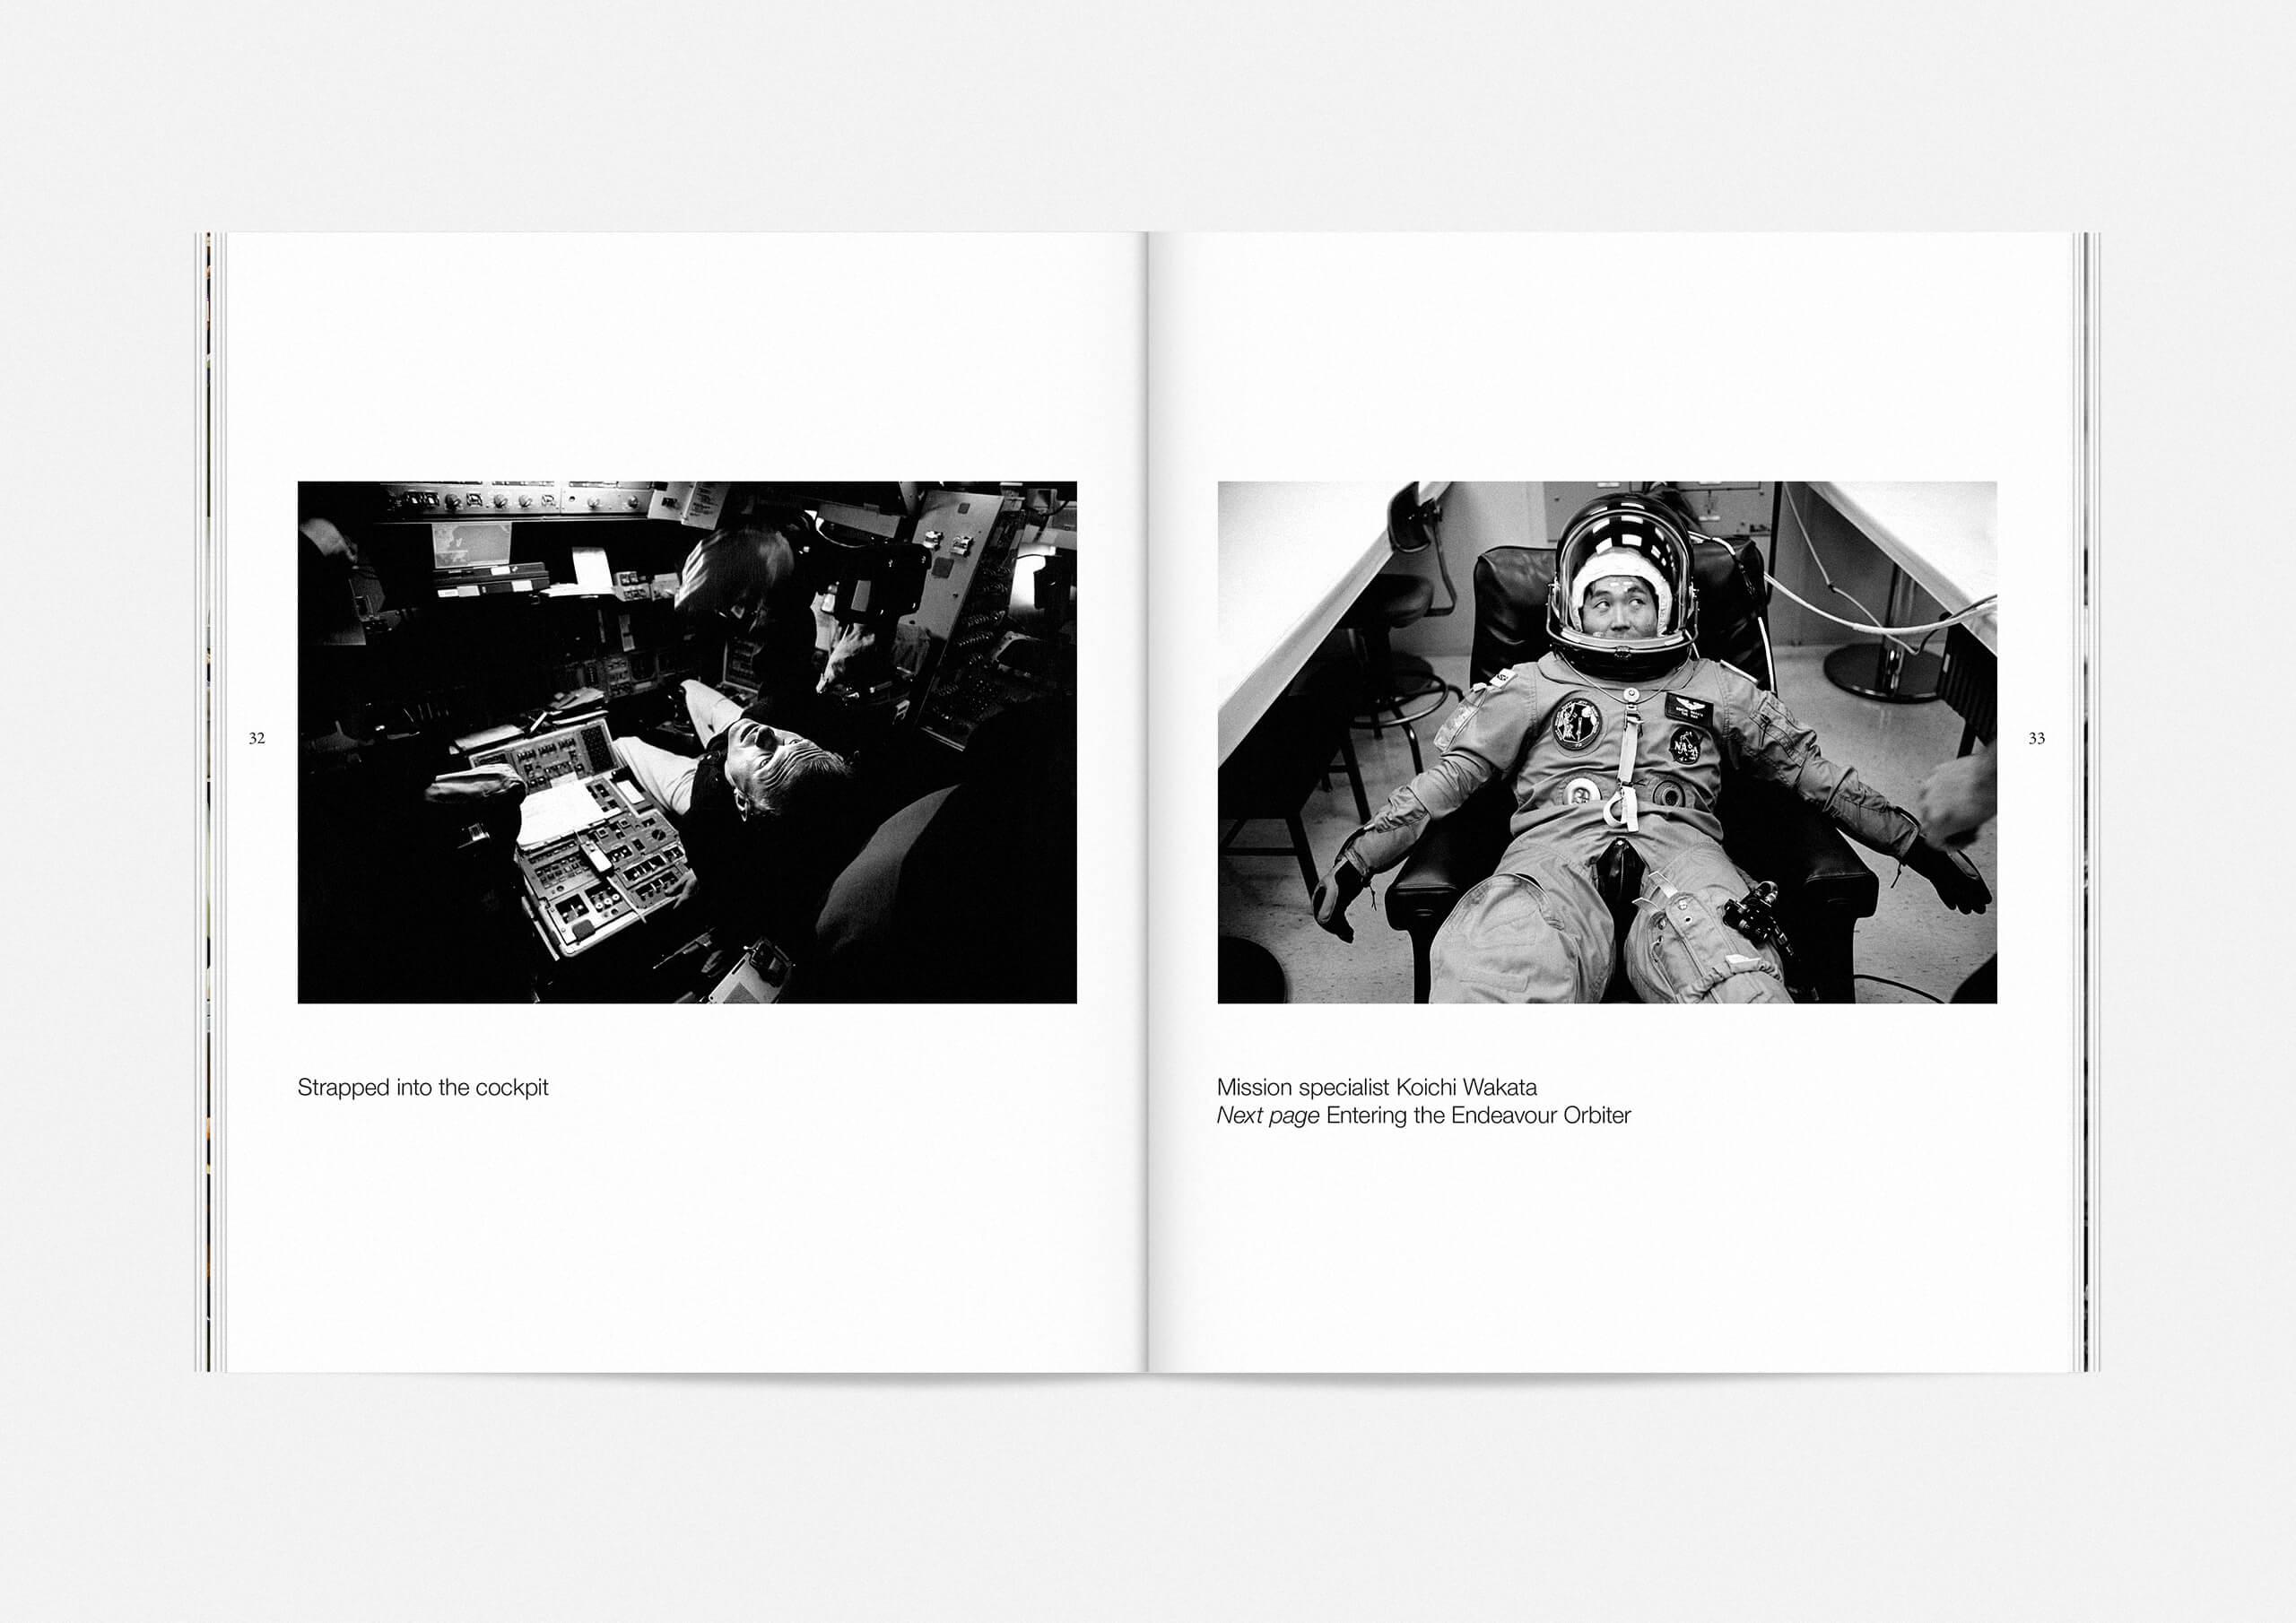 https://neuegestaltung.de/media/pages/clients/teller-magazine-issue-2/47c1ac6a2c-1597415082/teller_issue_02_innenseite_32_33_ng.jpg